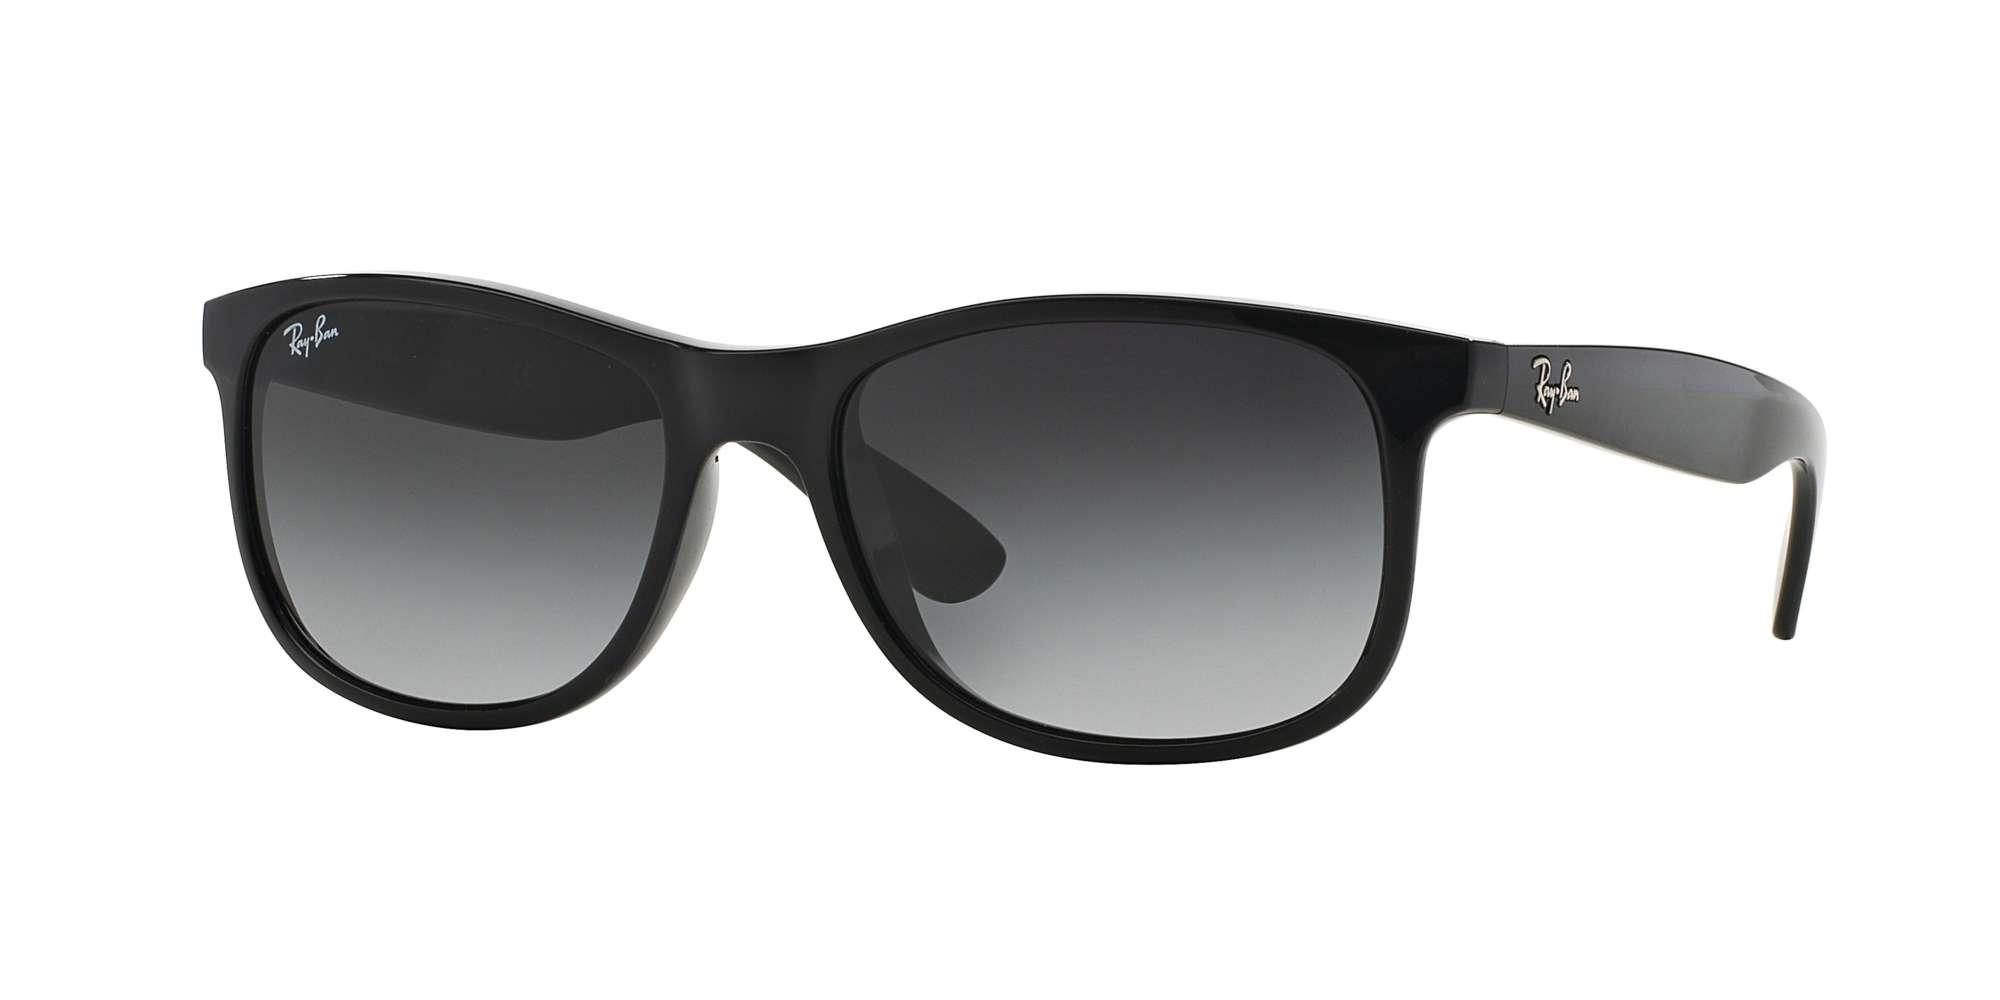 BLACK / GRAY GRADIENT lenses